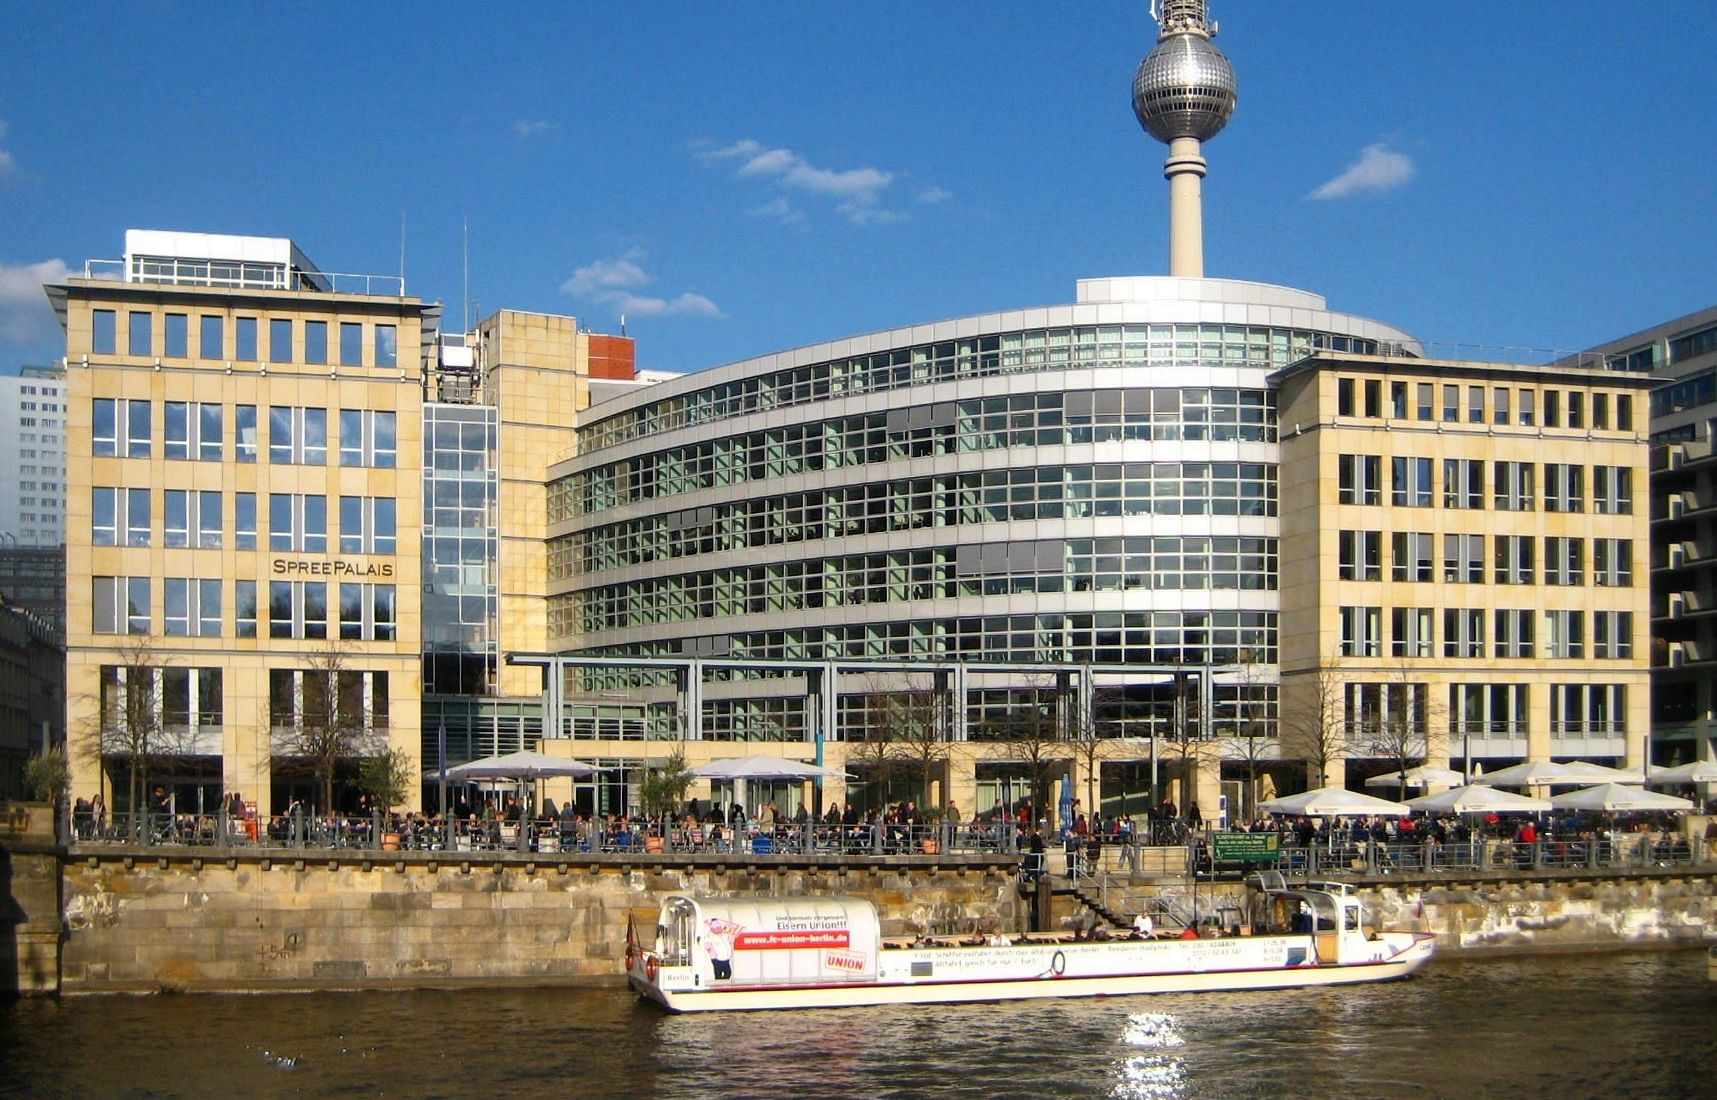 Ansicht Büro Helmholtz-Geschäftsstelle in Berlin im Spreepalais